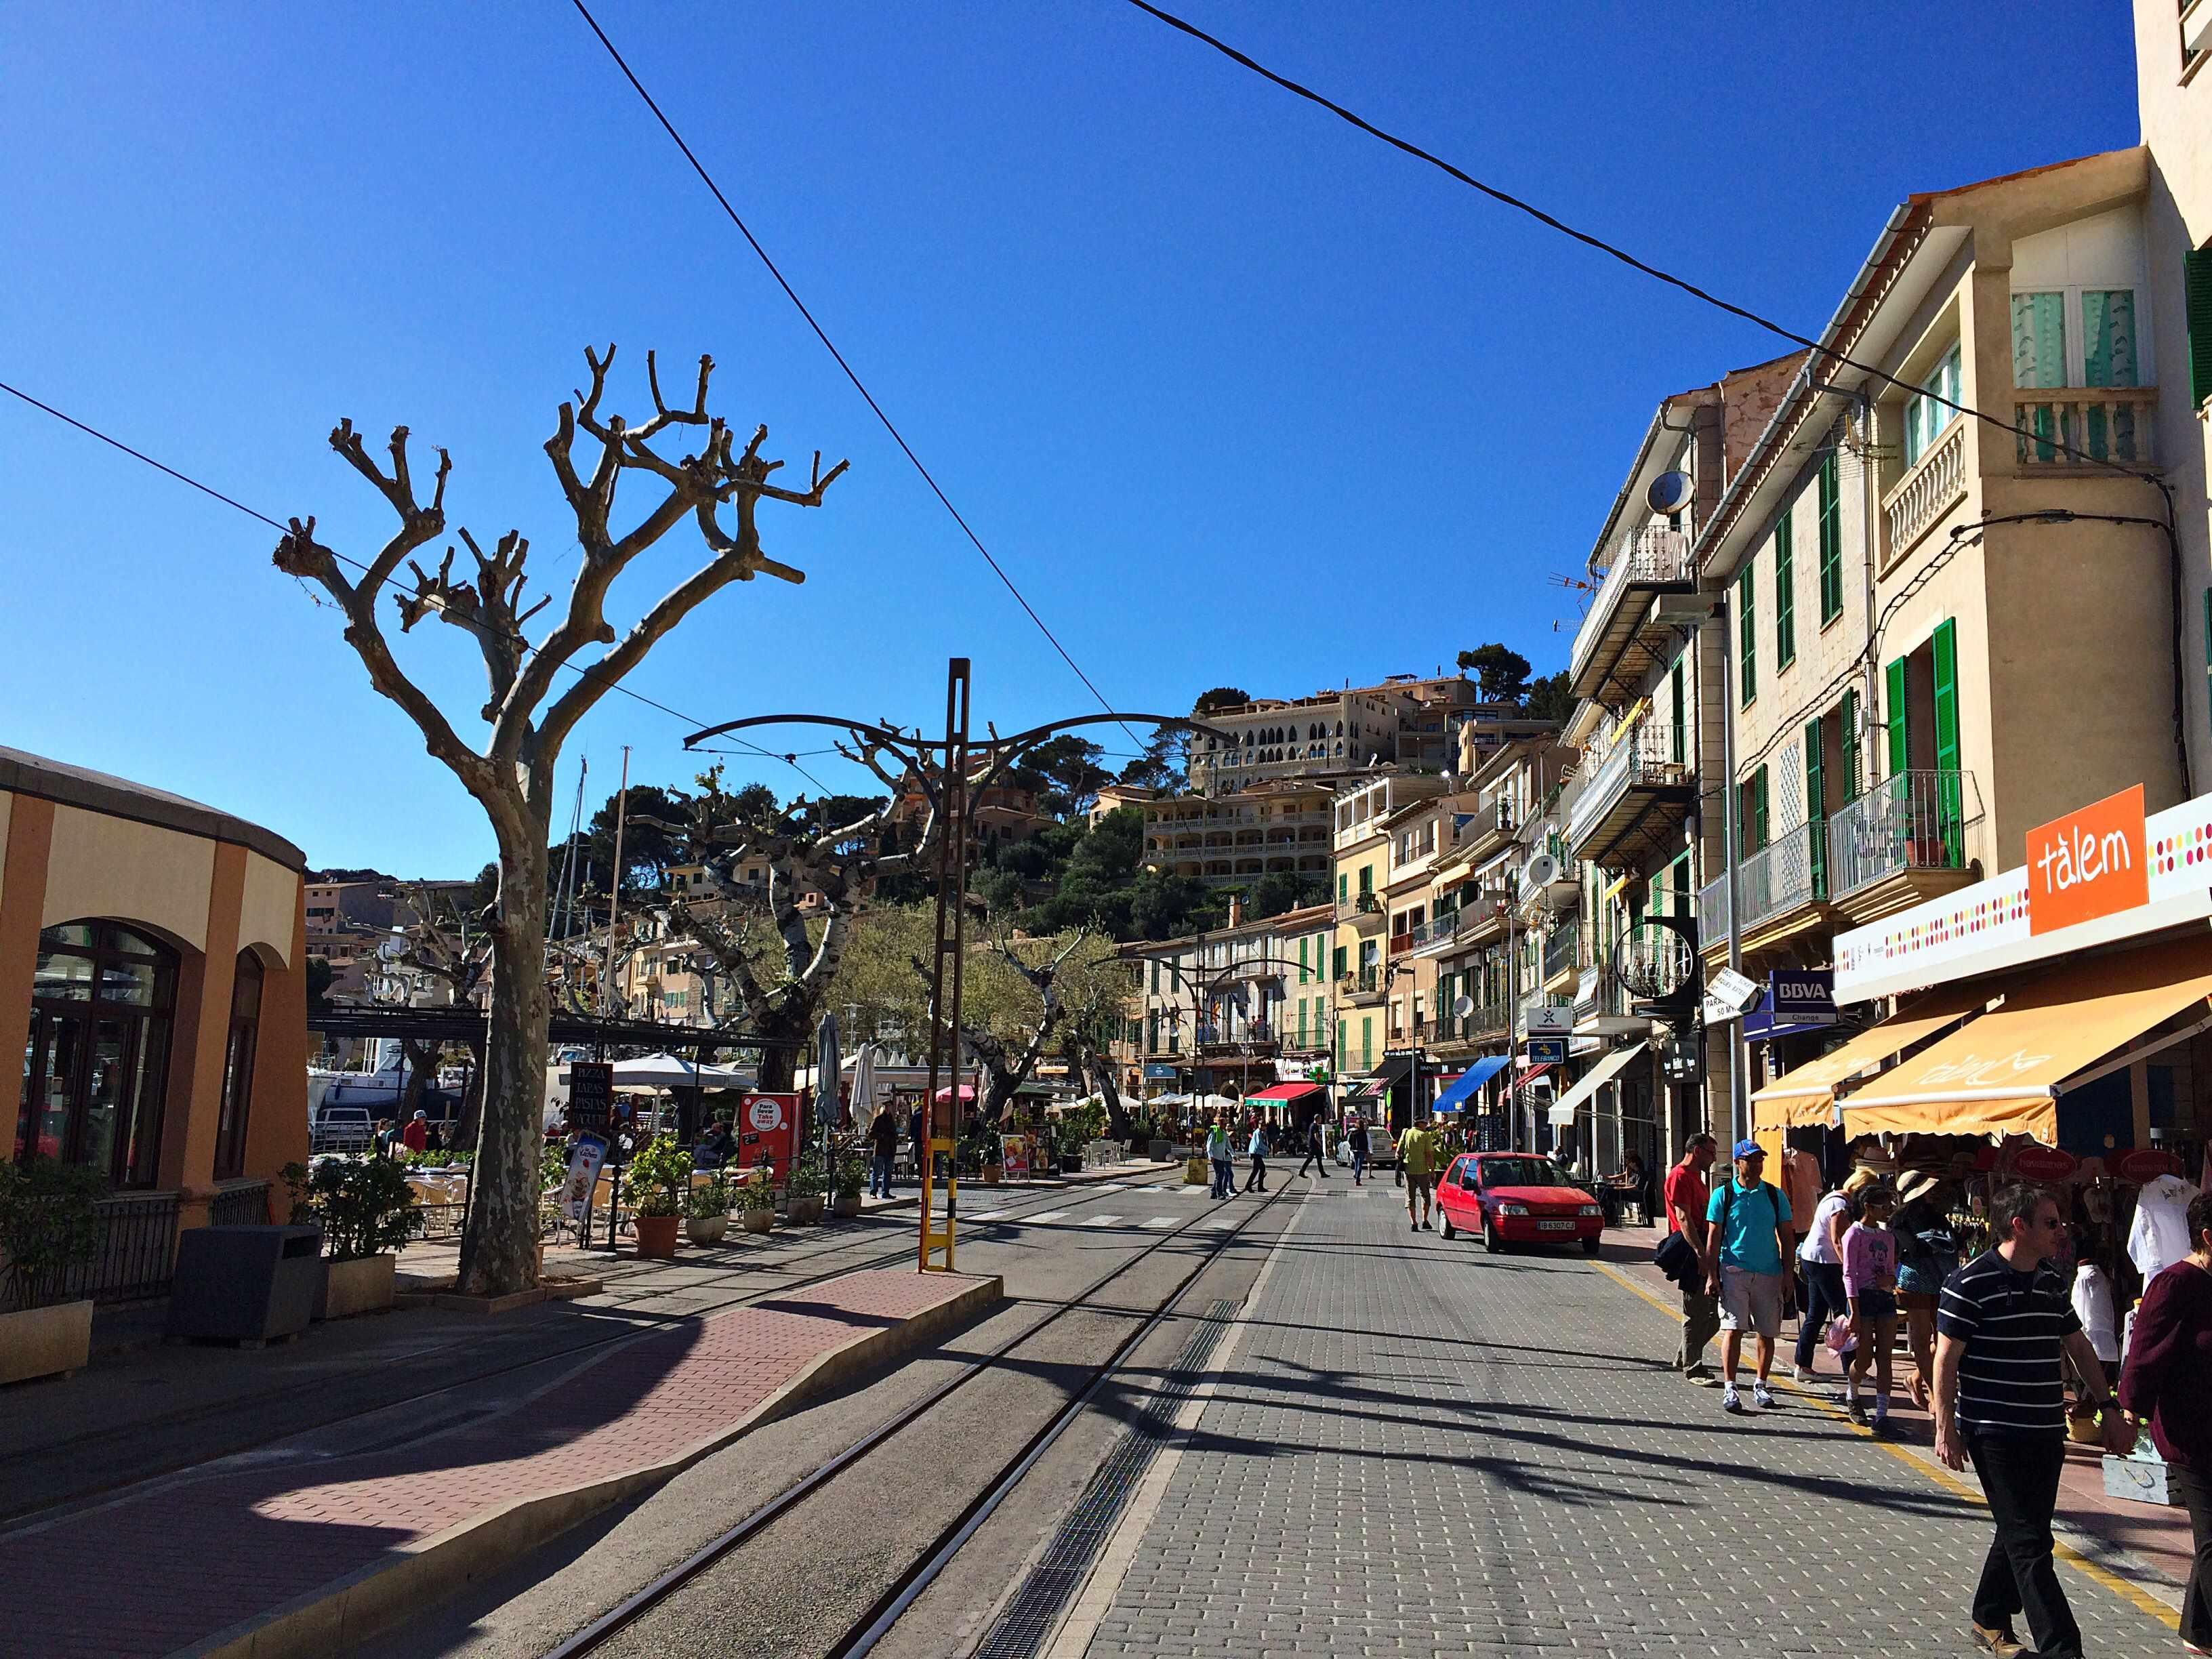 Mein perfektes Mallorca Wochenende staedtereisen sonne land und leute mallorca familie europa  tui berlin mallorca promenade port de soller